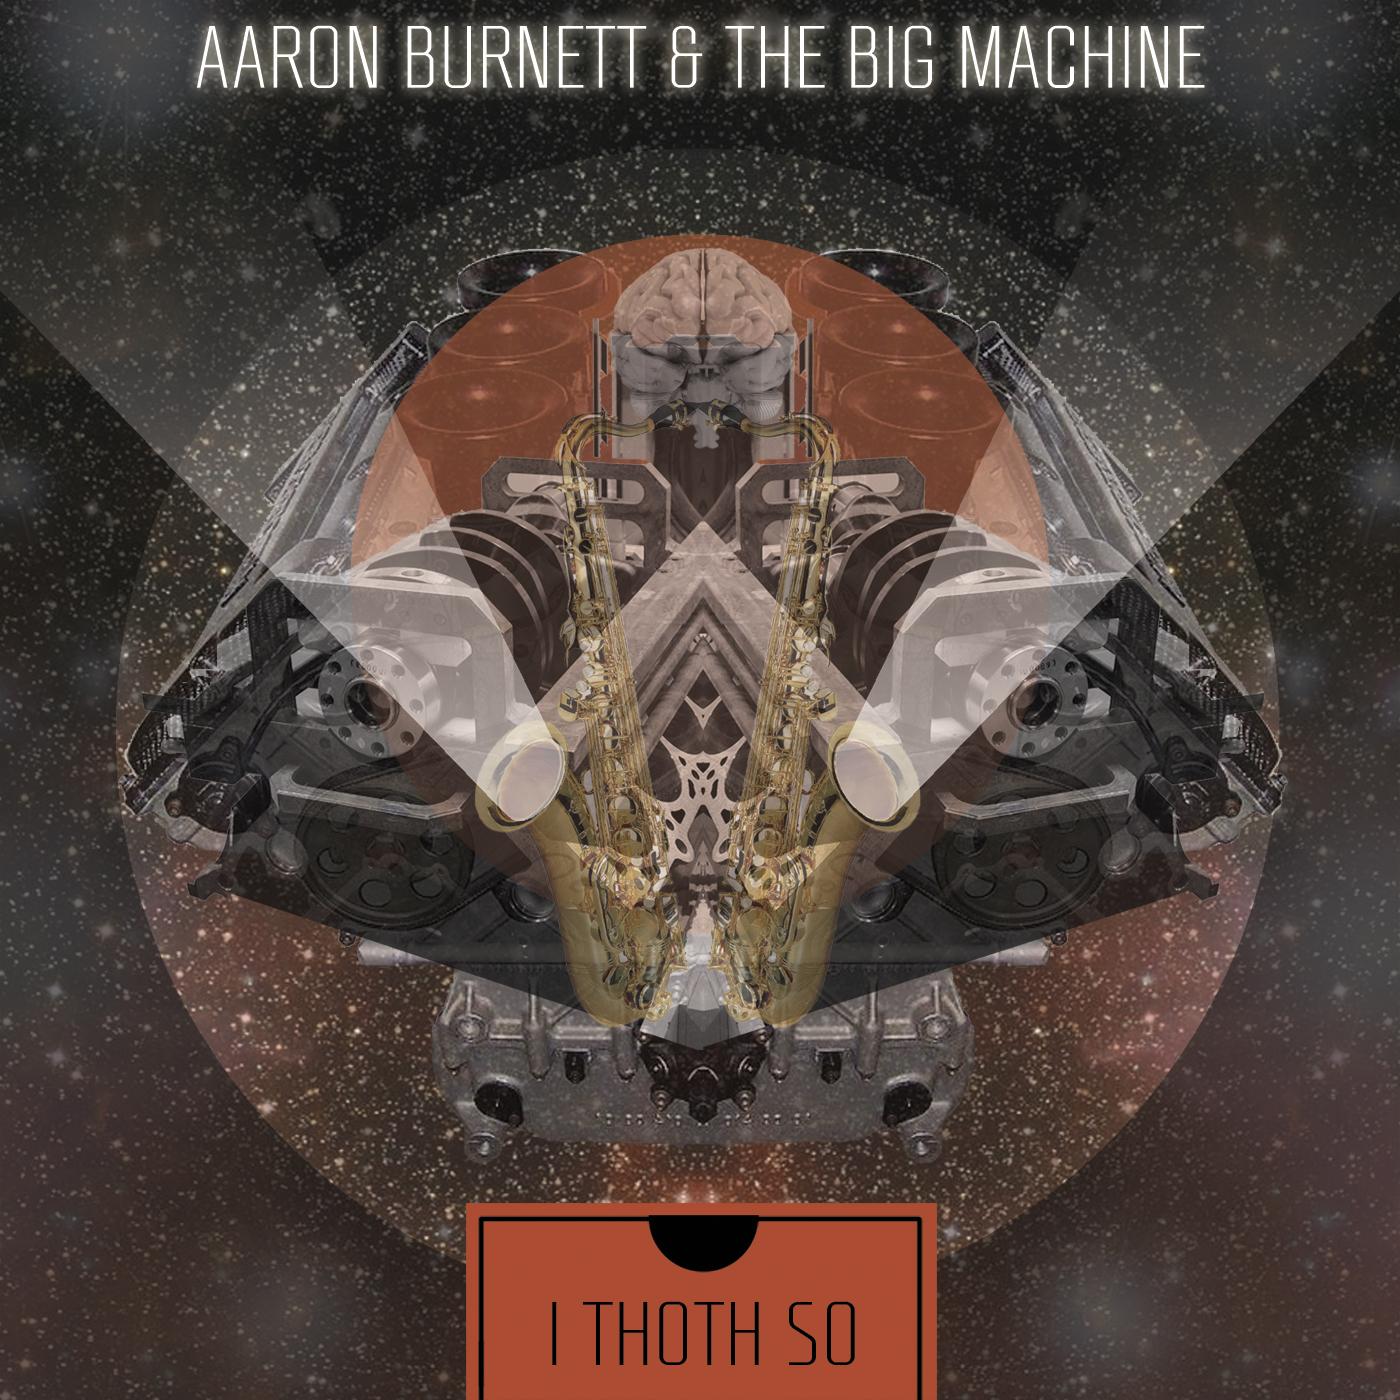 Aaron Burnett & The Big Machine Album Art